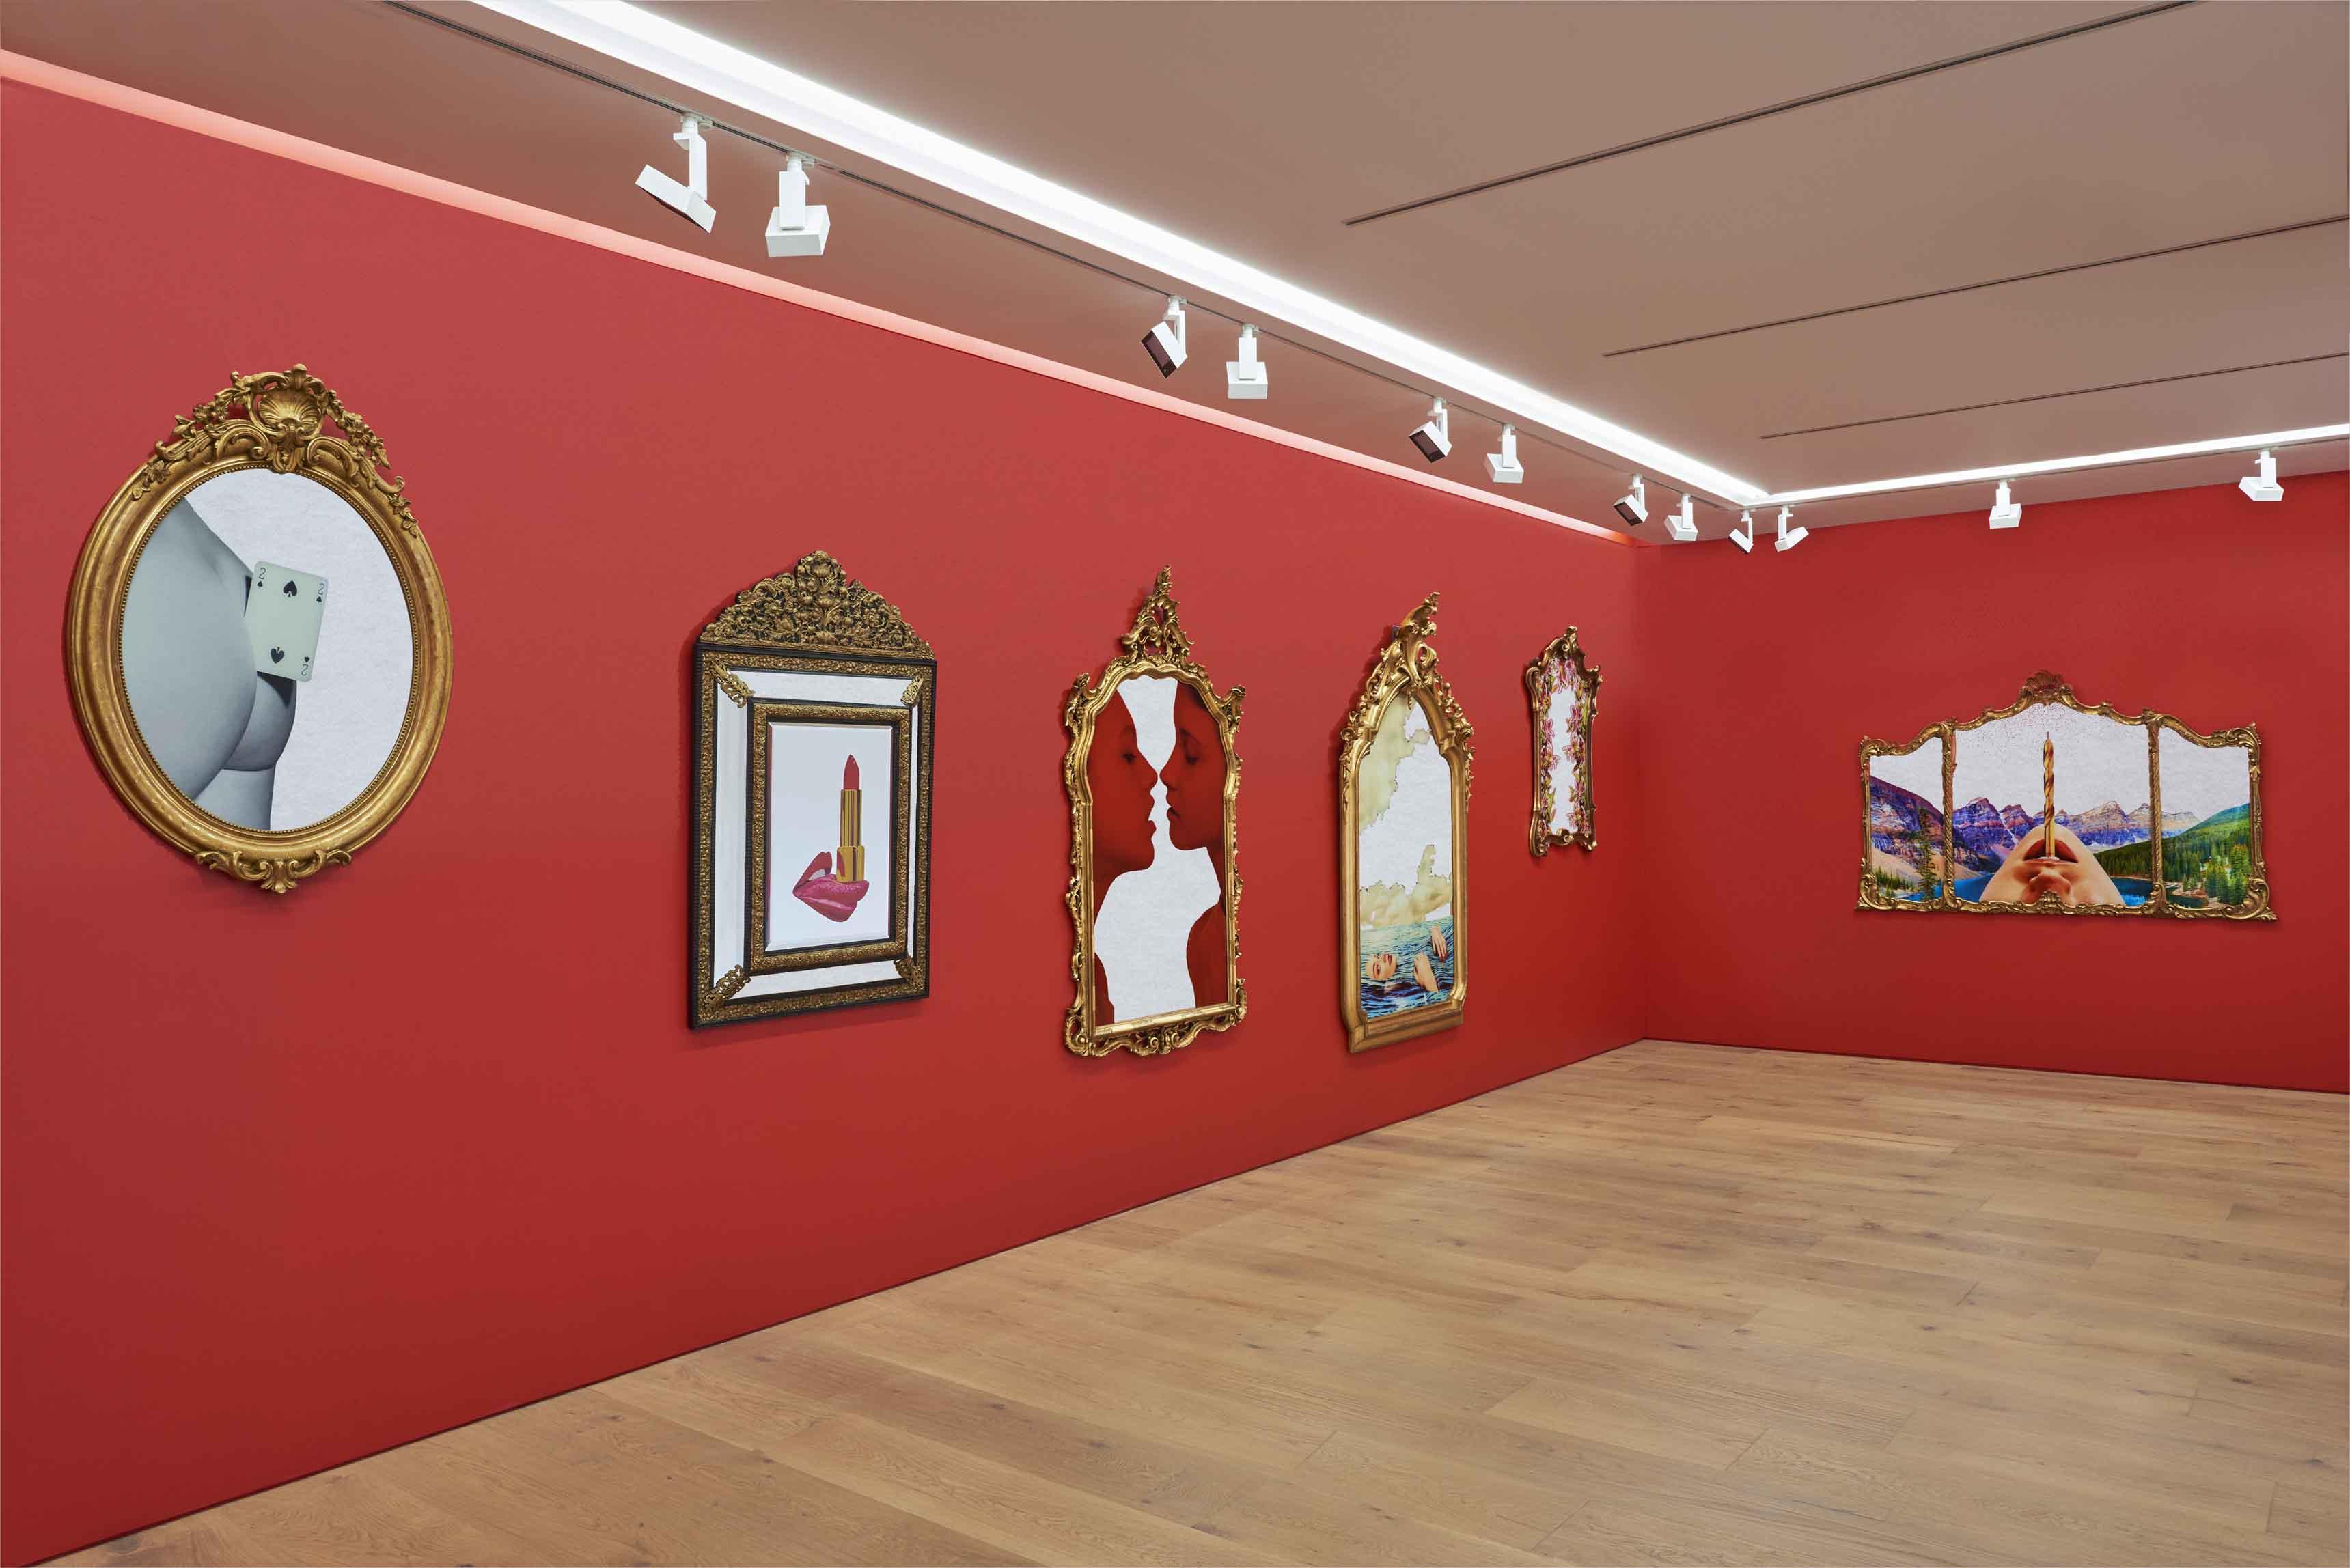 View of the exhibition TOILETPAPER – Collaboration between Maurizio Cattelan & Pierpaolo Ferrari at Perrotin, Tokyo, 2017-2018 Photo: Masahiro Miramatsu © TOILETPAPER Courtesy Perrotin